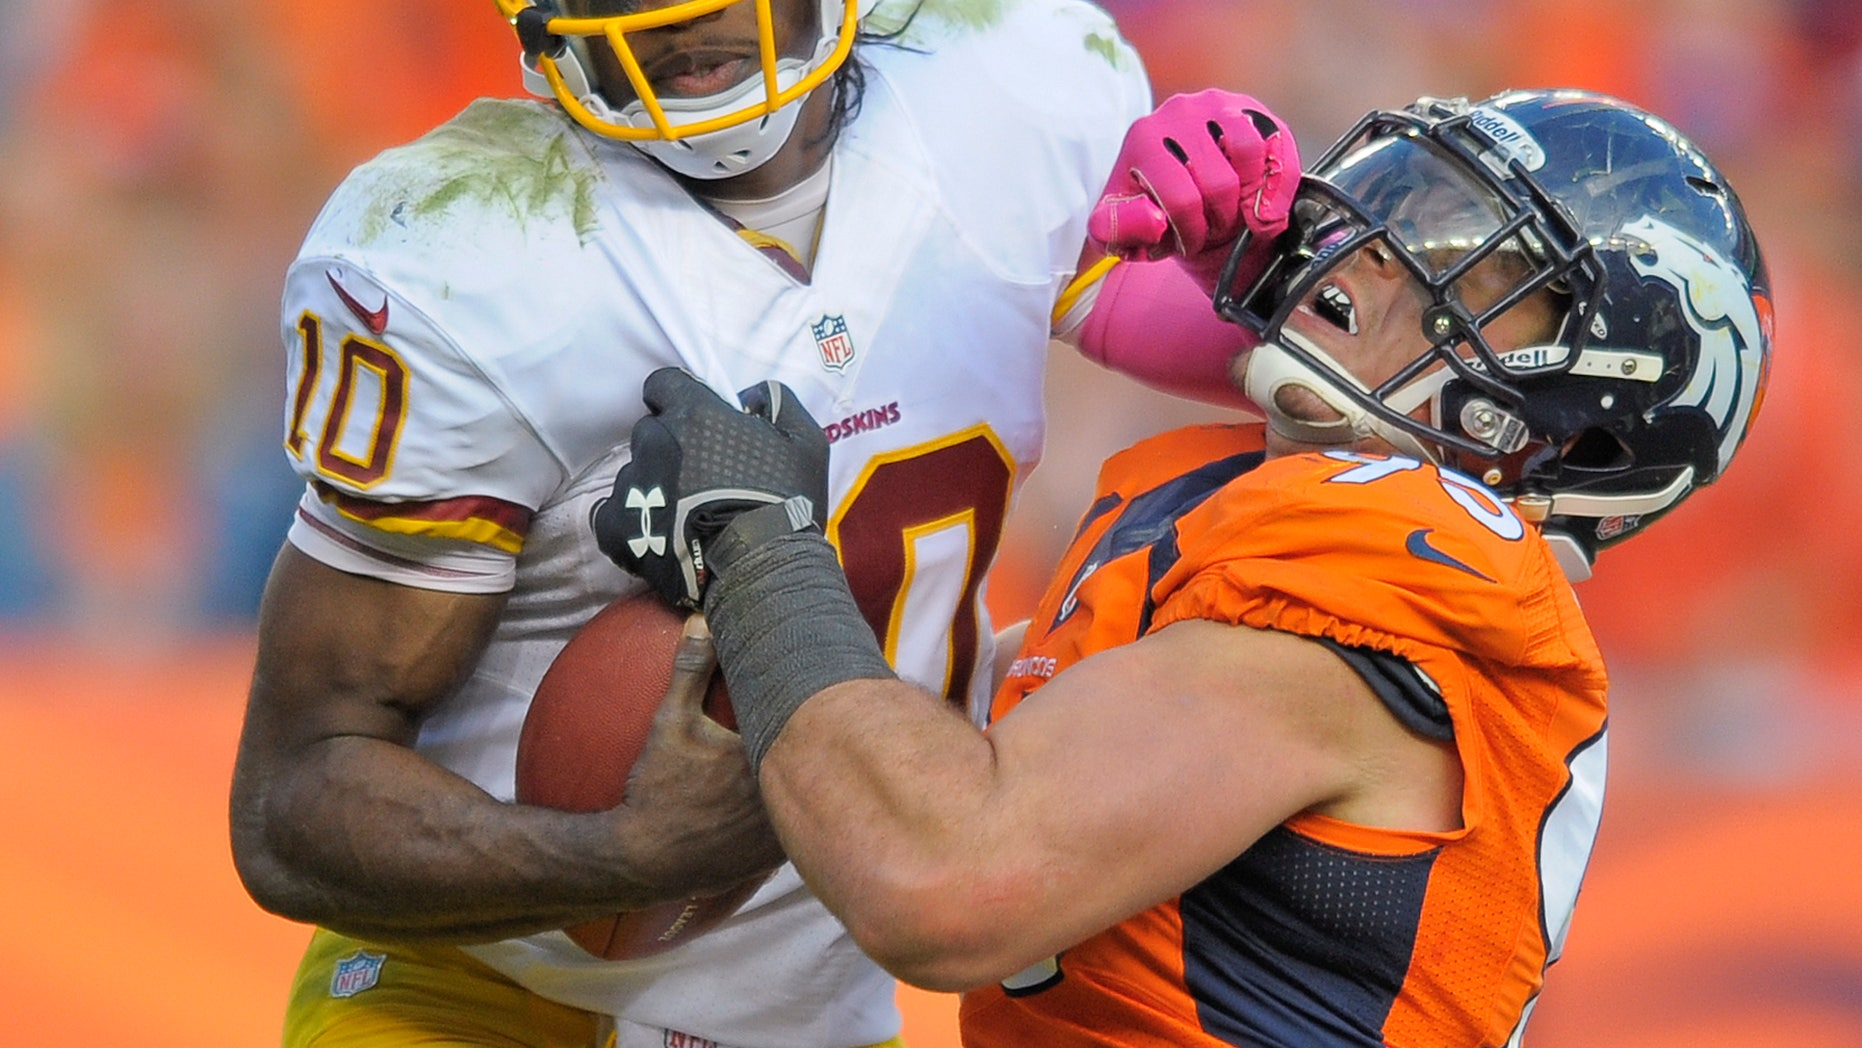 Washington Redskins quarterback Robert Griffin III (10) stiff arms Denver Broncos defensive end Derek Wolfe (95) in the fourth quarter of an NFL football game, Sunday, Oct. 27, 2013, in Denver. (AP Photo/Jack Dempsey)